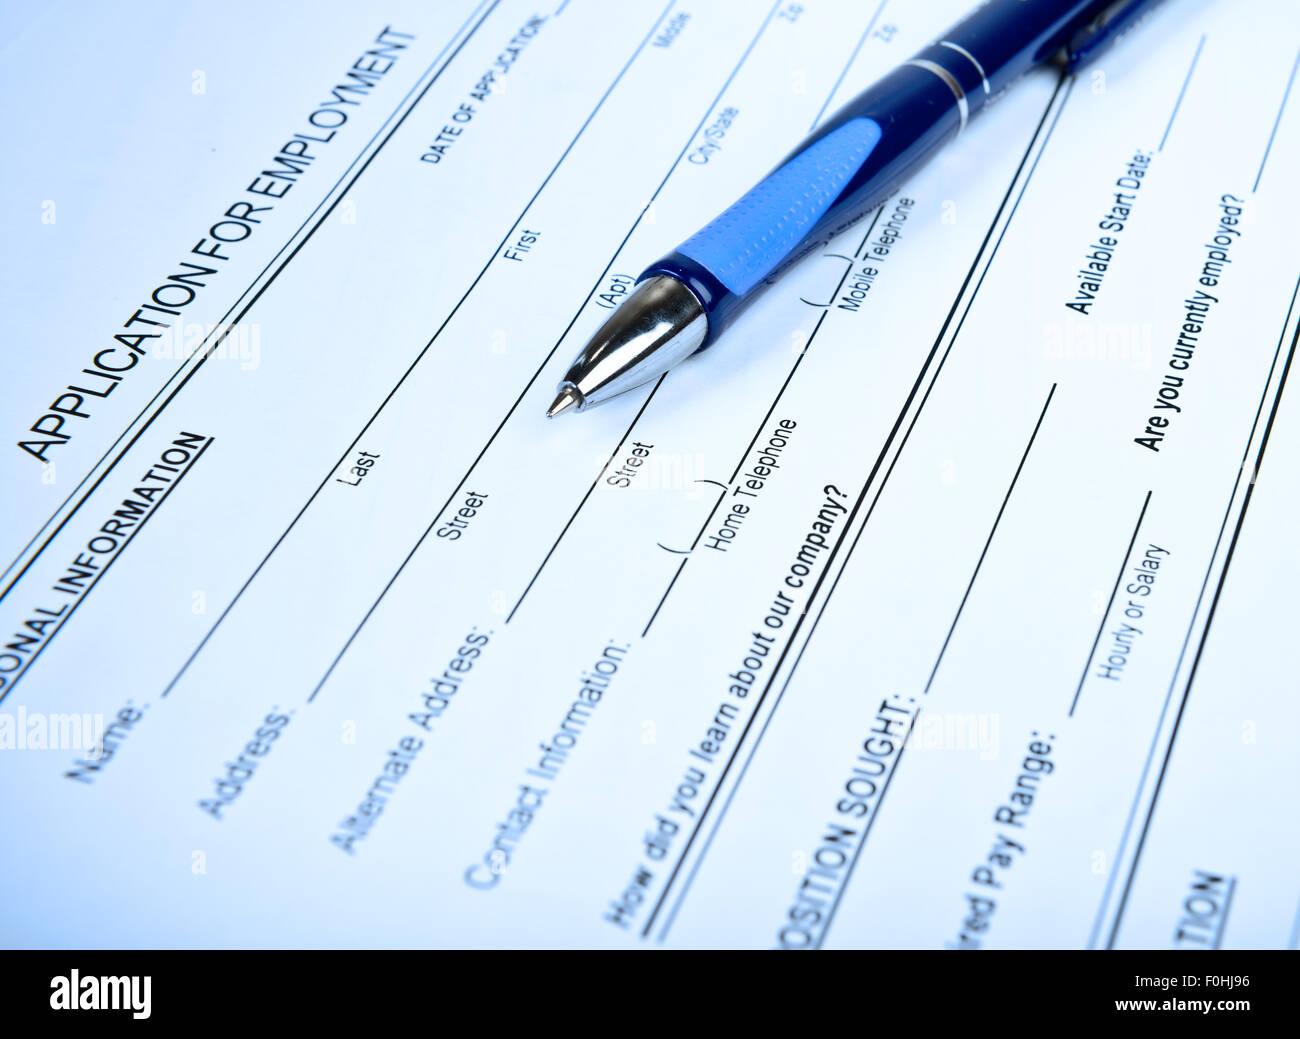 Solicitud de empleo en tonos azul Imagen De Stock